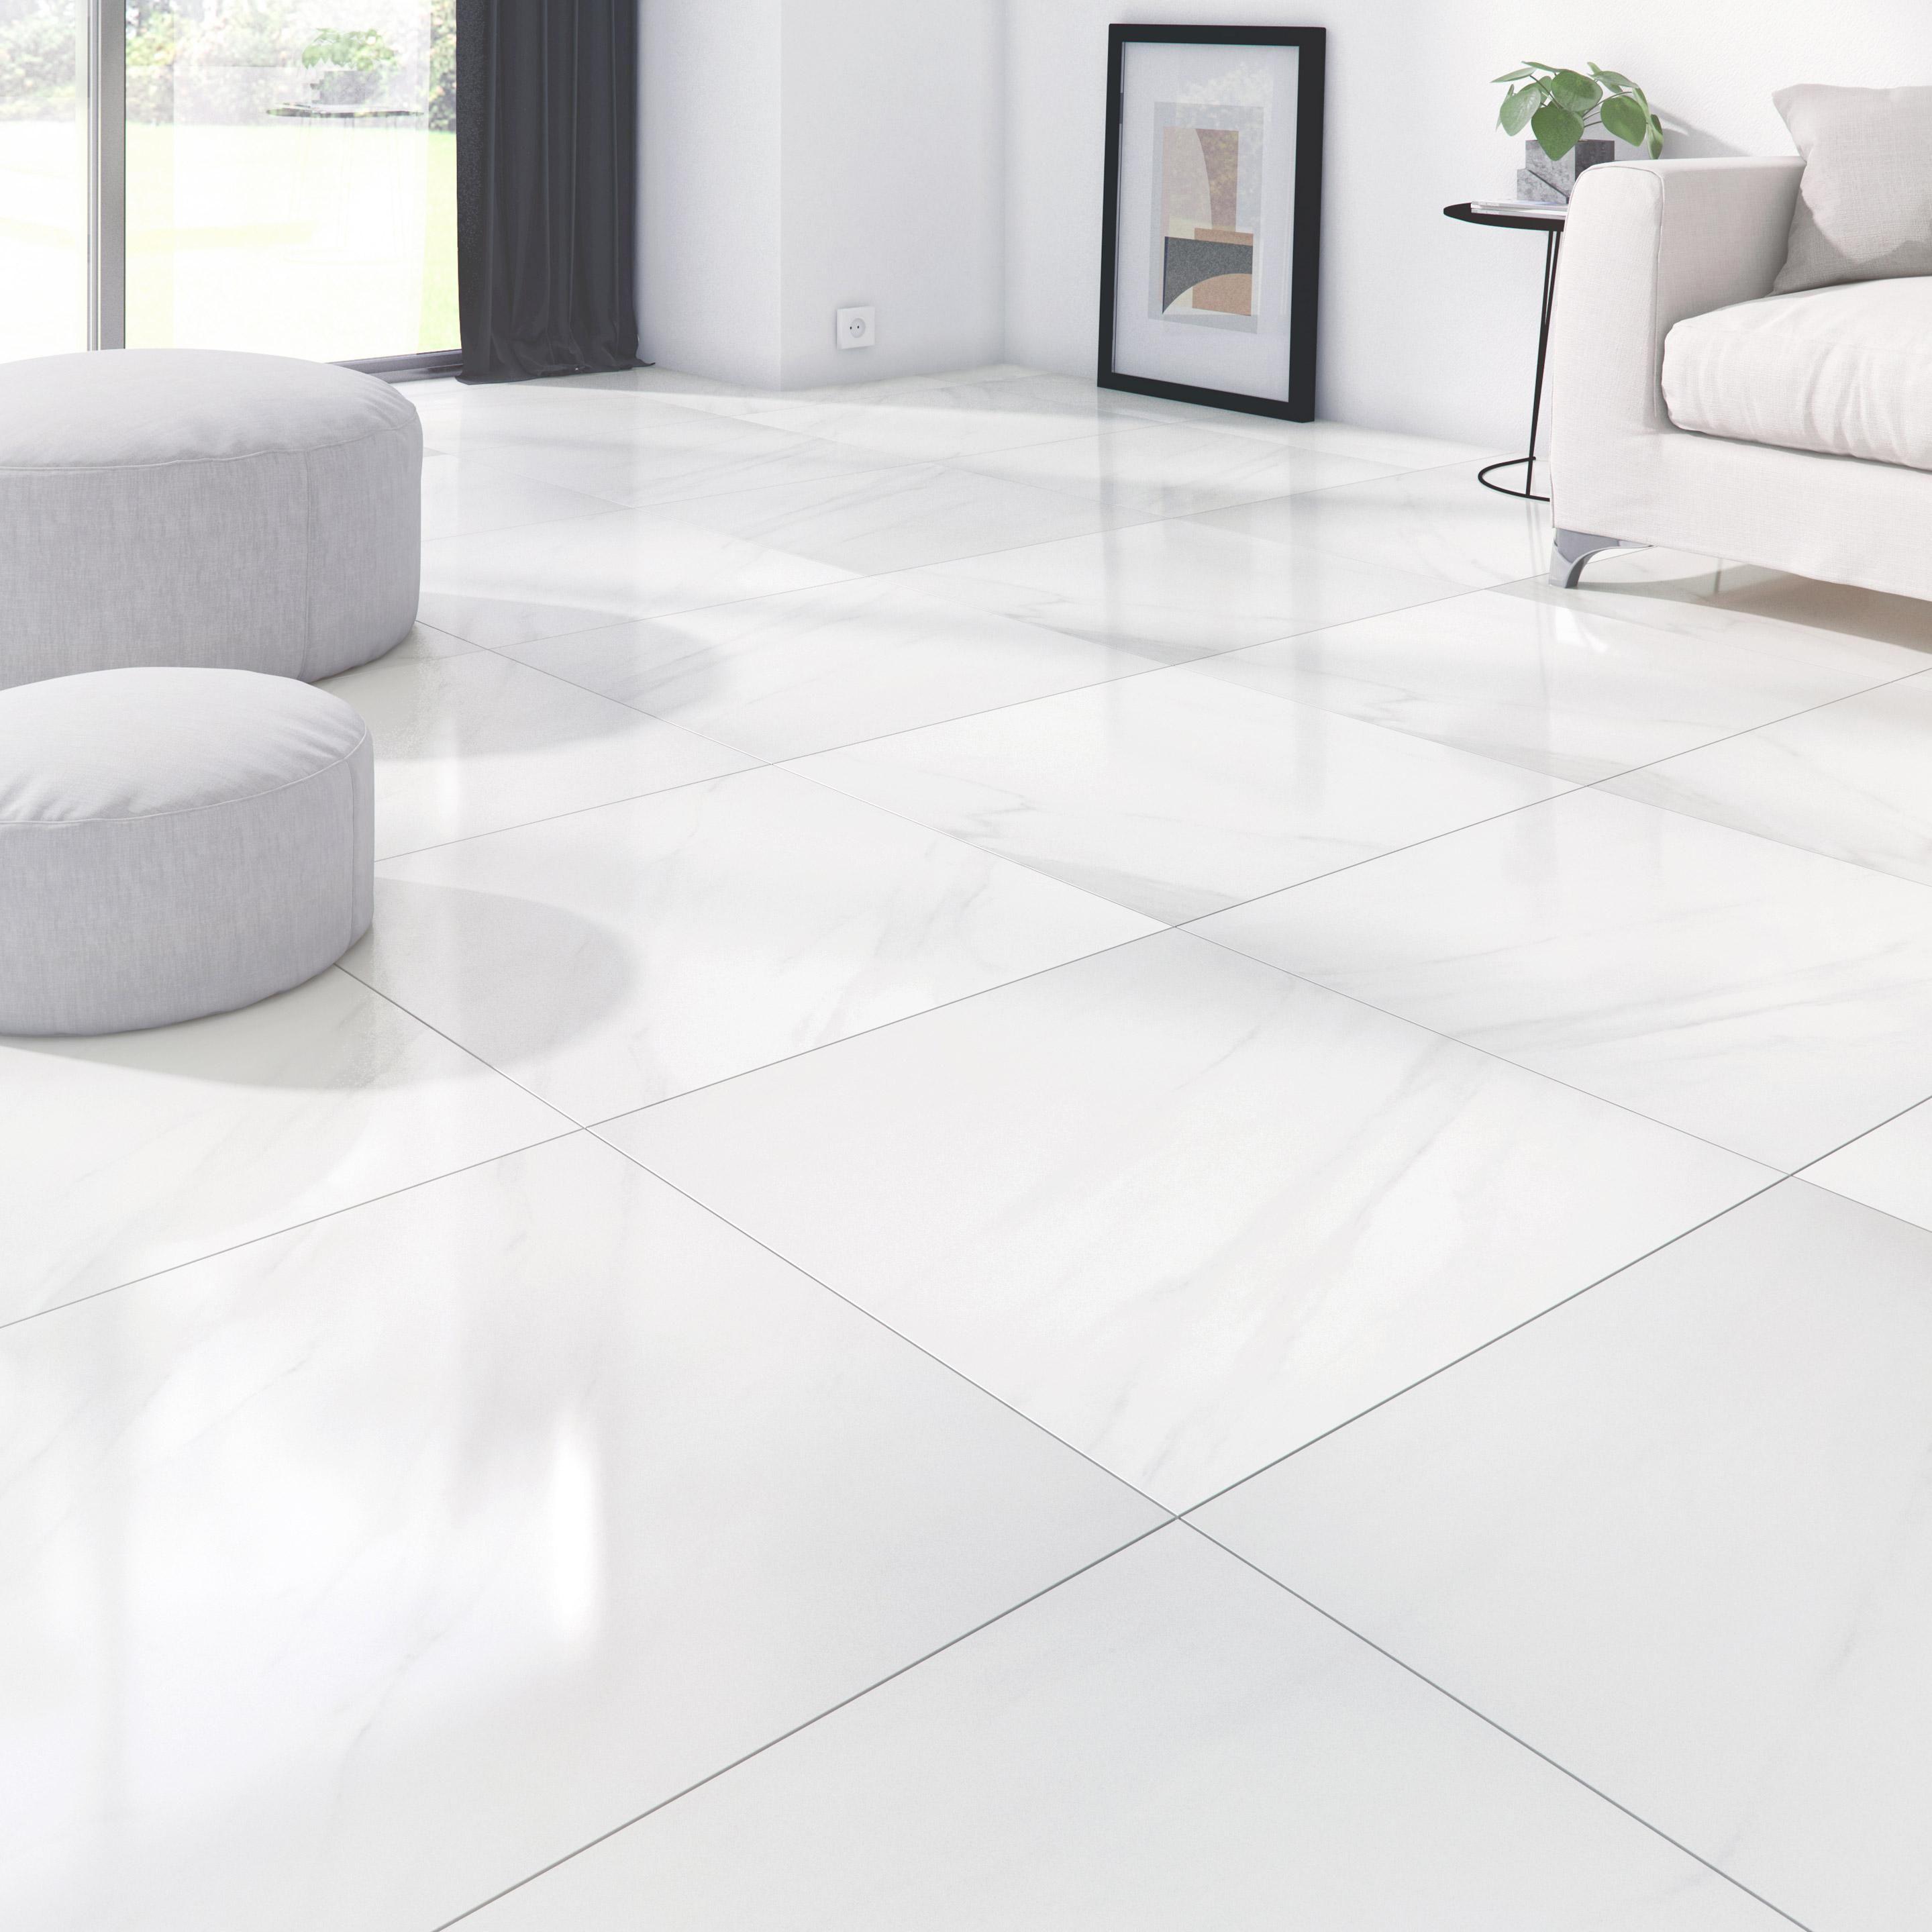 Carrelage Sol Et Mur Intenso Effet Marbre Blanc Marmi L 60 X L 60 Cm Artens Leroy Merlin En 2020 Carrelage Sol Carrelage Interieur Carreaux En Marbre